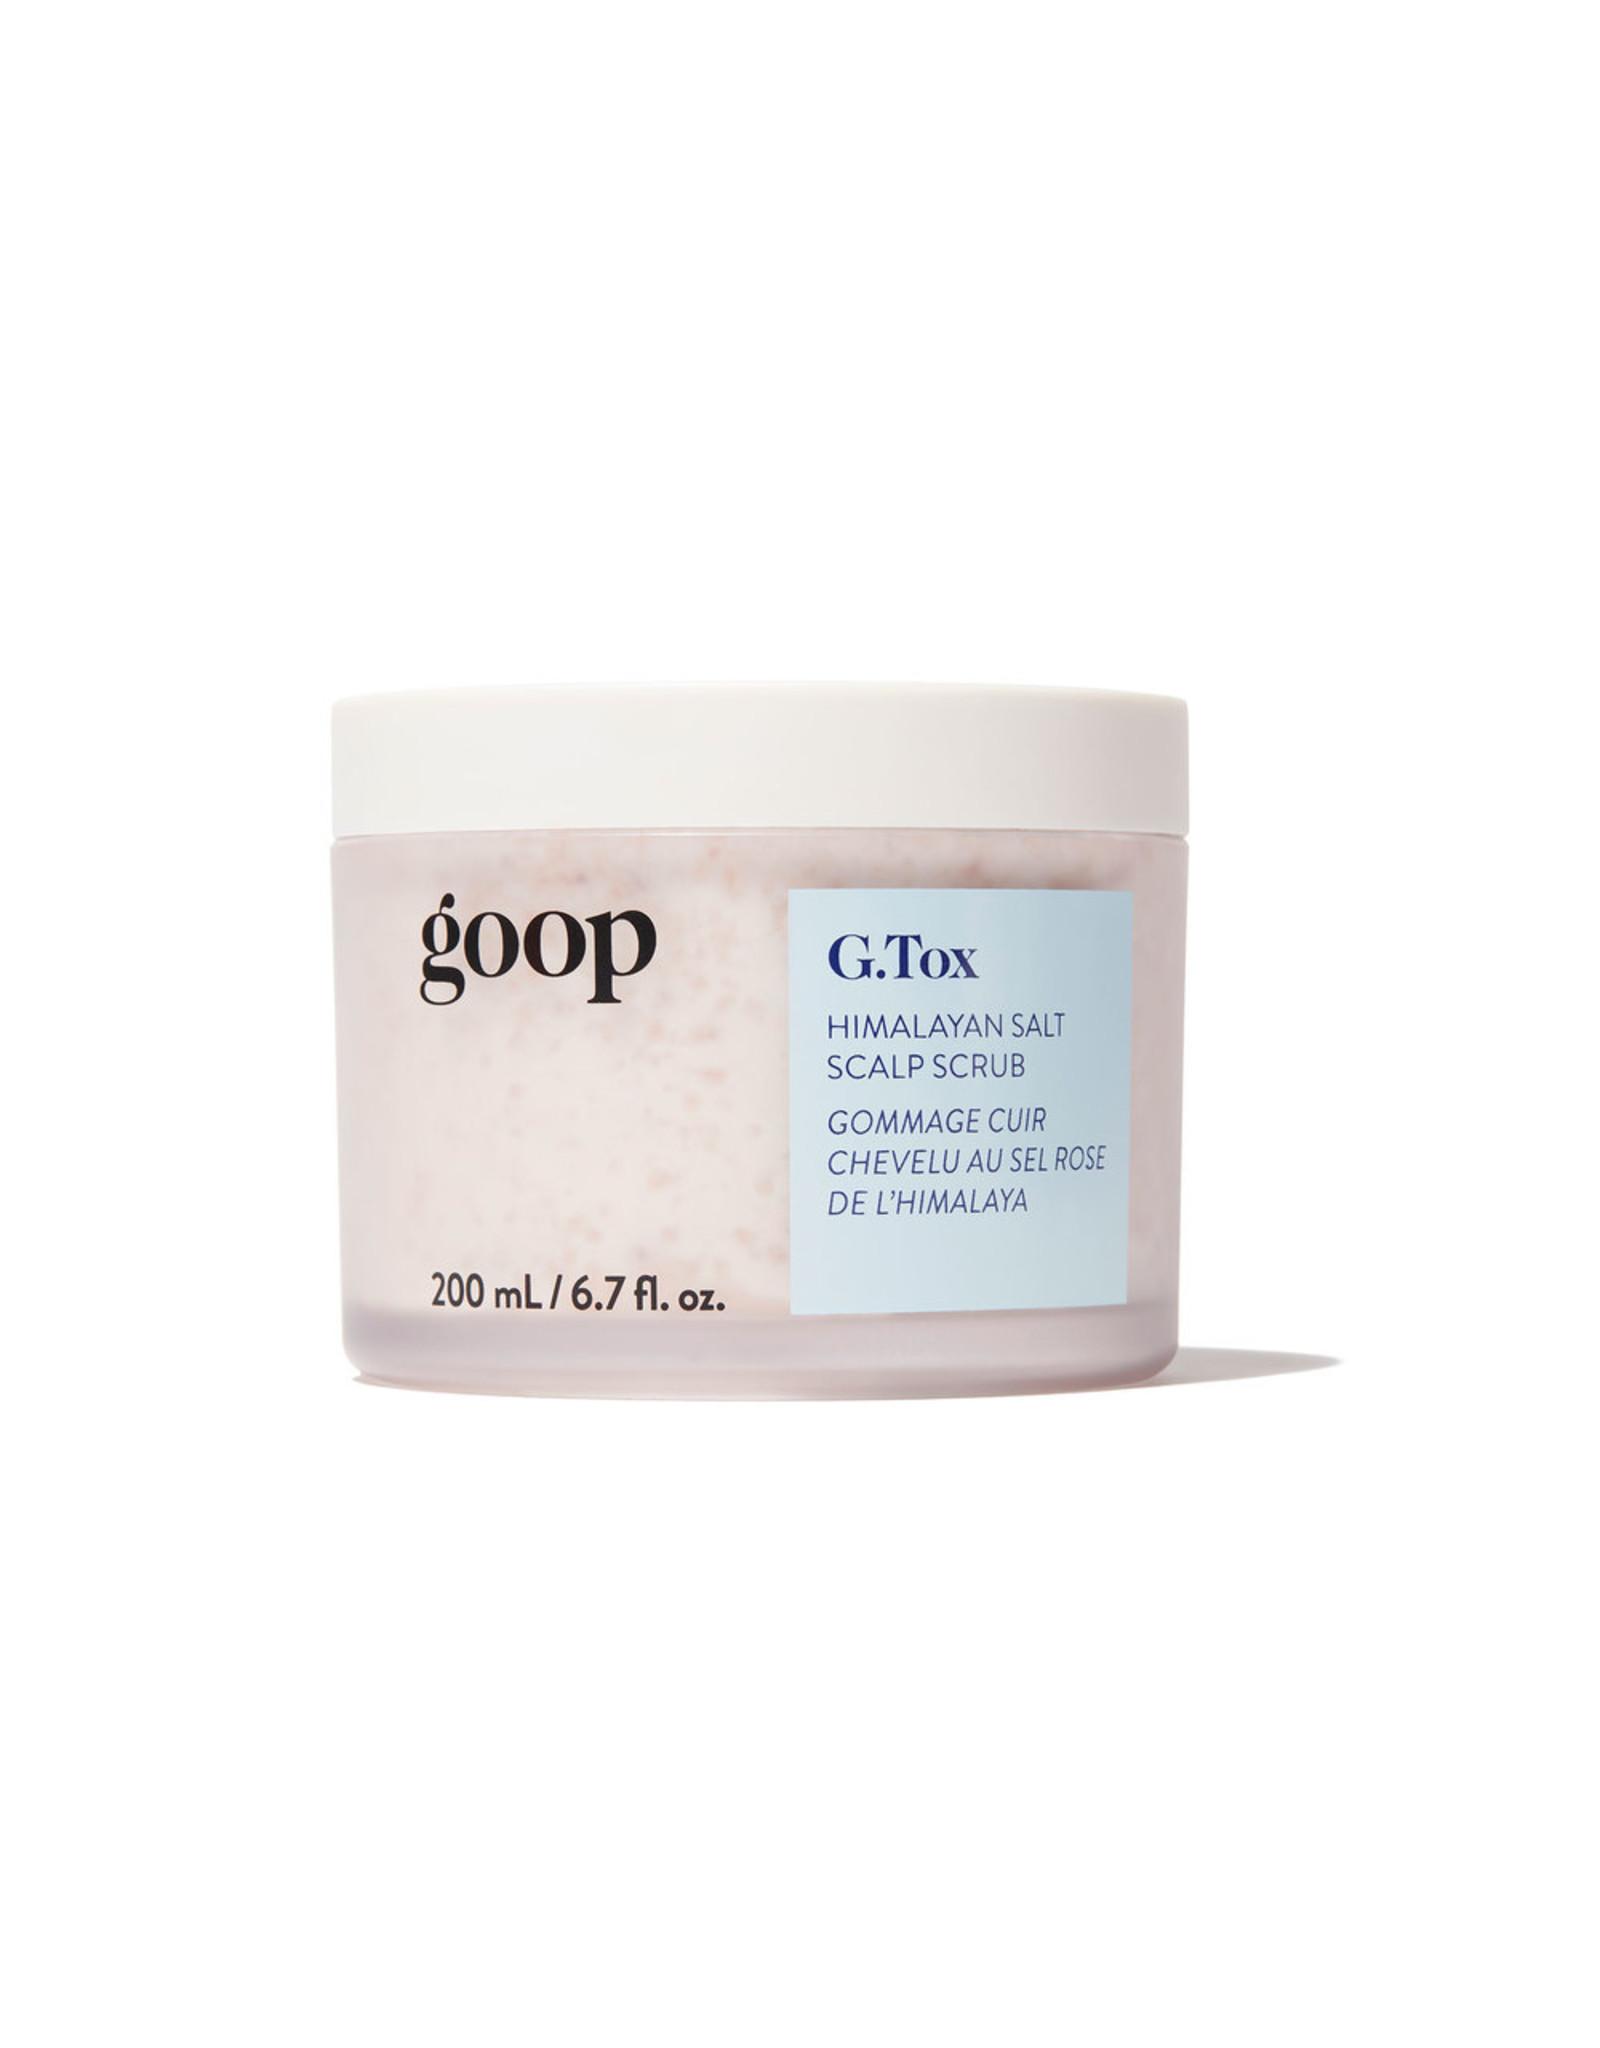 goop Body goop Beauty G.Tox Himalayan Salt Scalp Scrub Shampoo